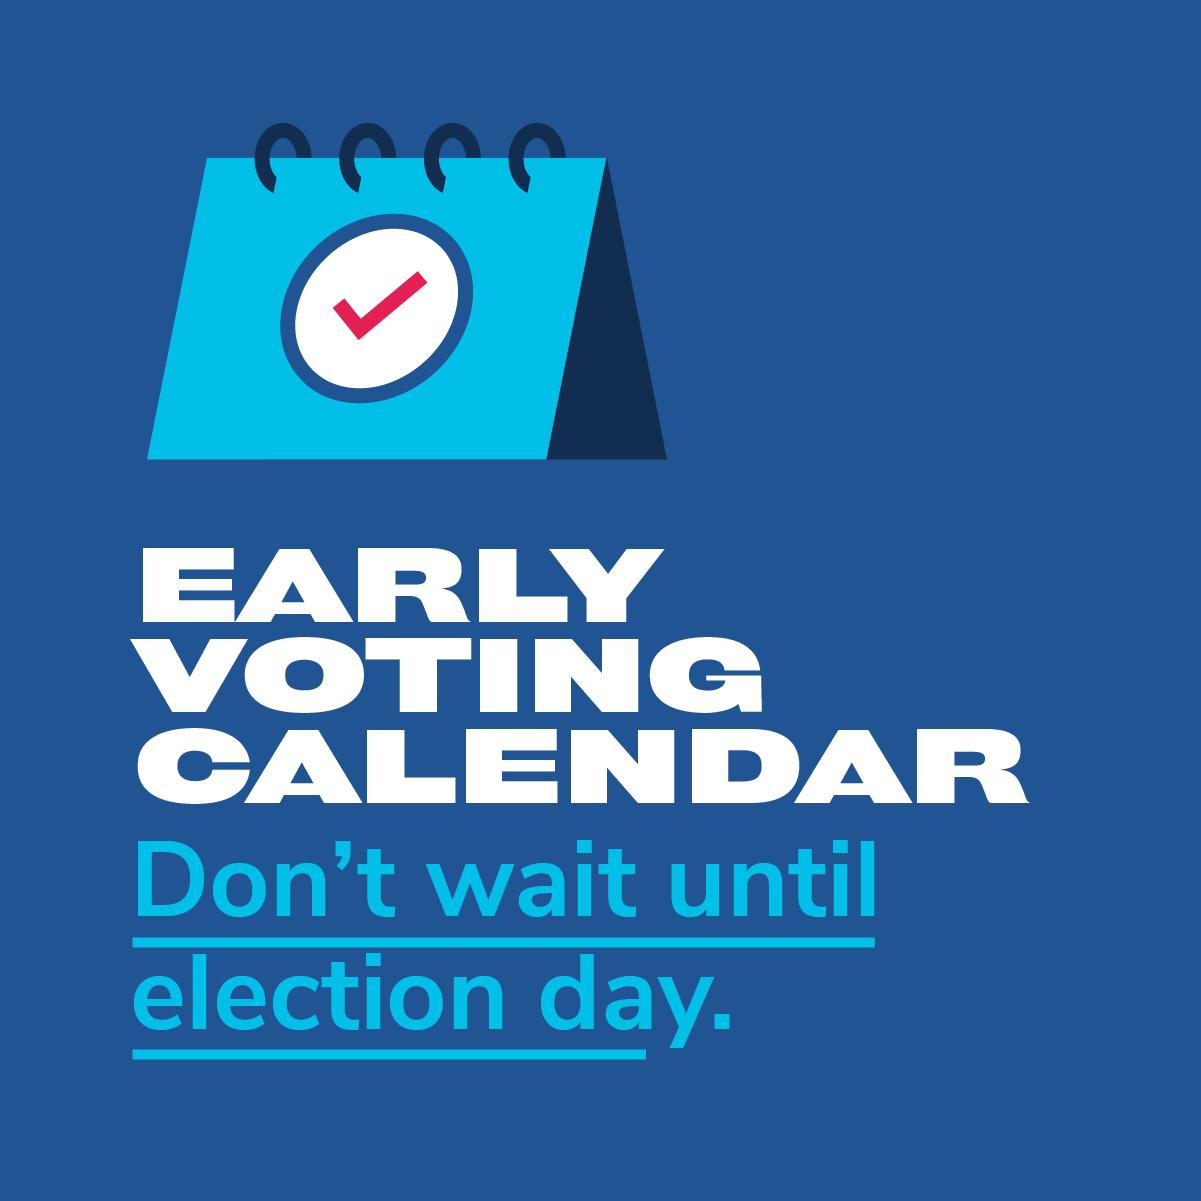 og-early-voting-calendar-square-image